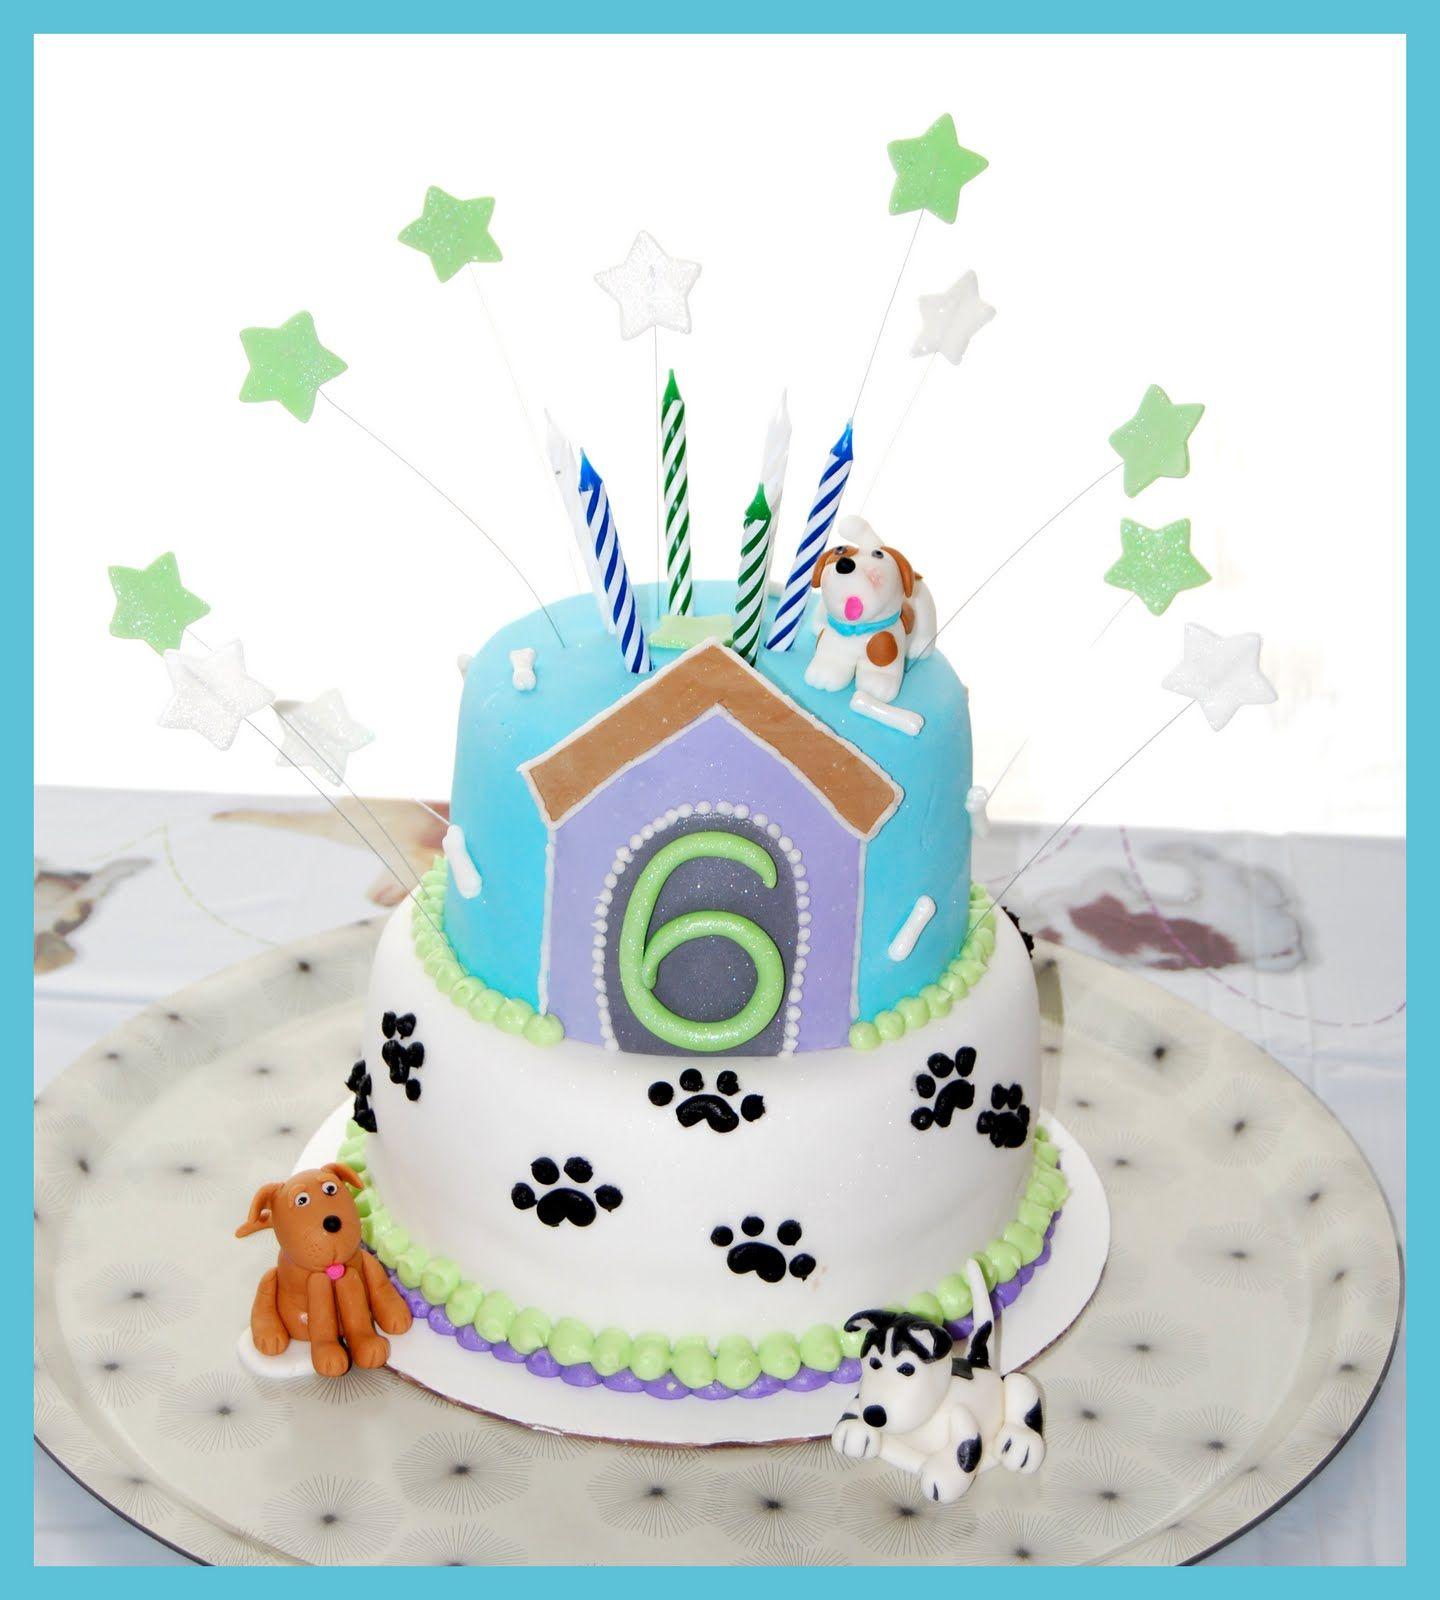 Jeneze Cake Design Puppy Cake Utah County Cake Decorator